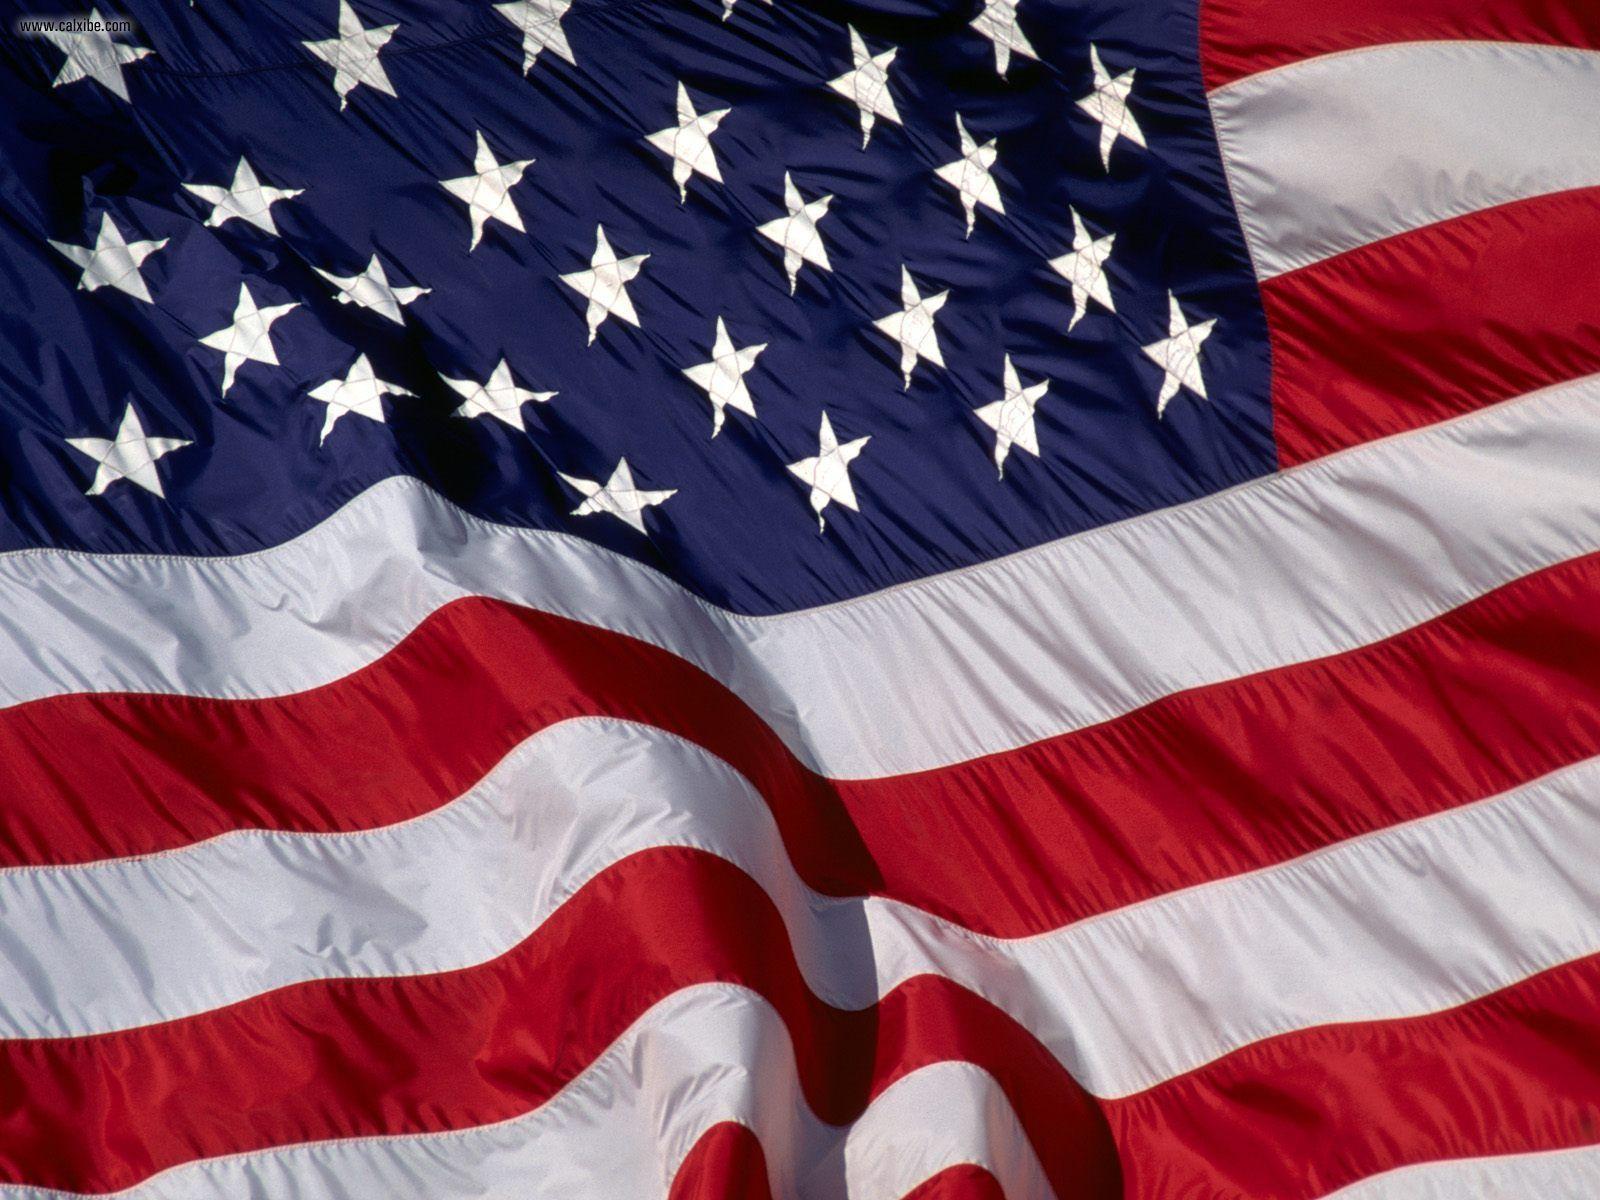 Us Flag Wallpaper 3d - www.